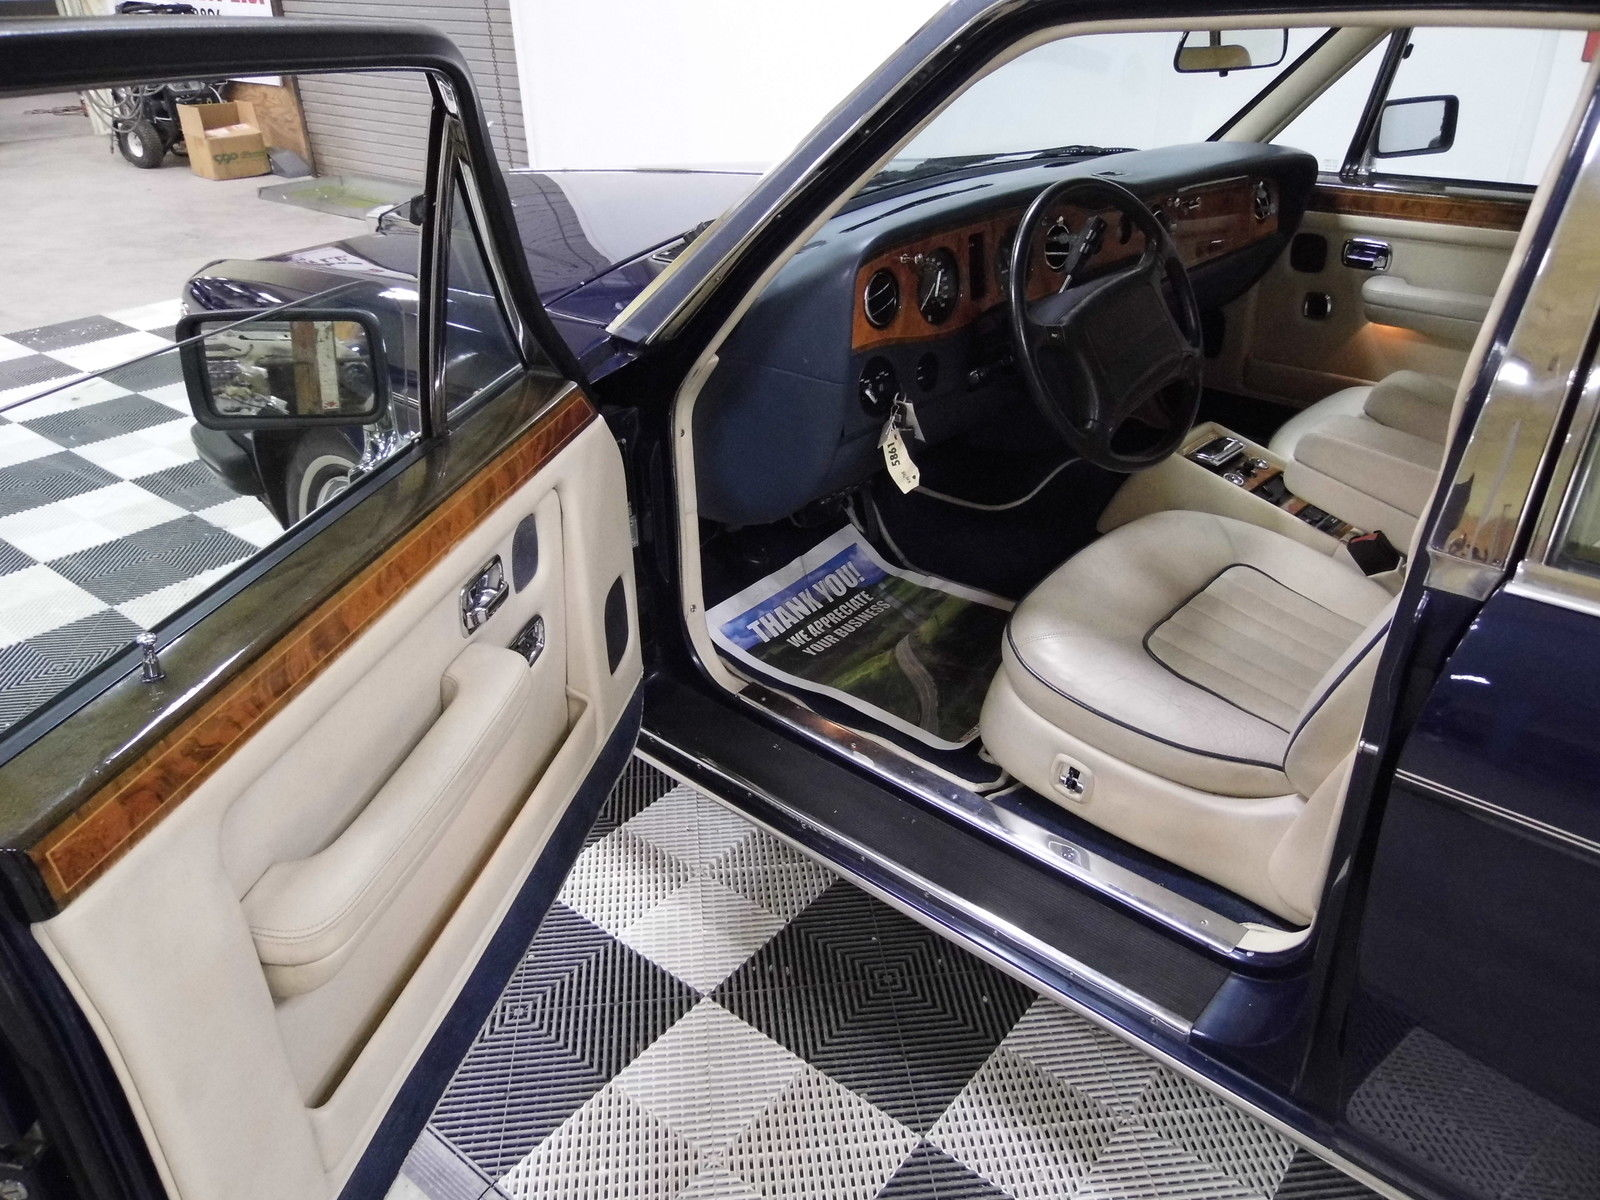 1991 rolls royce silver spur ii for sale in hamilton for Rolls royce motor cars dallas